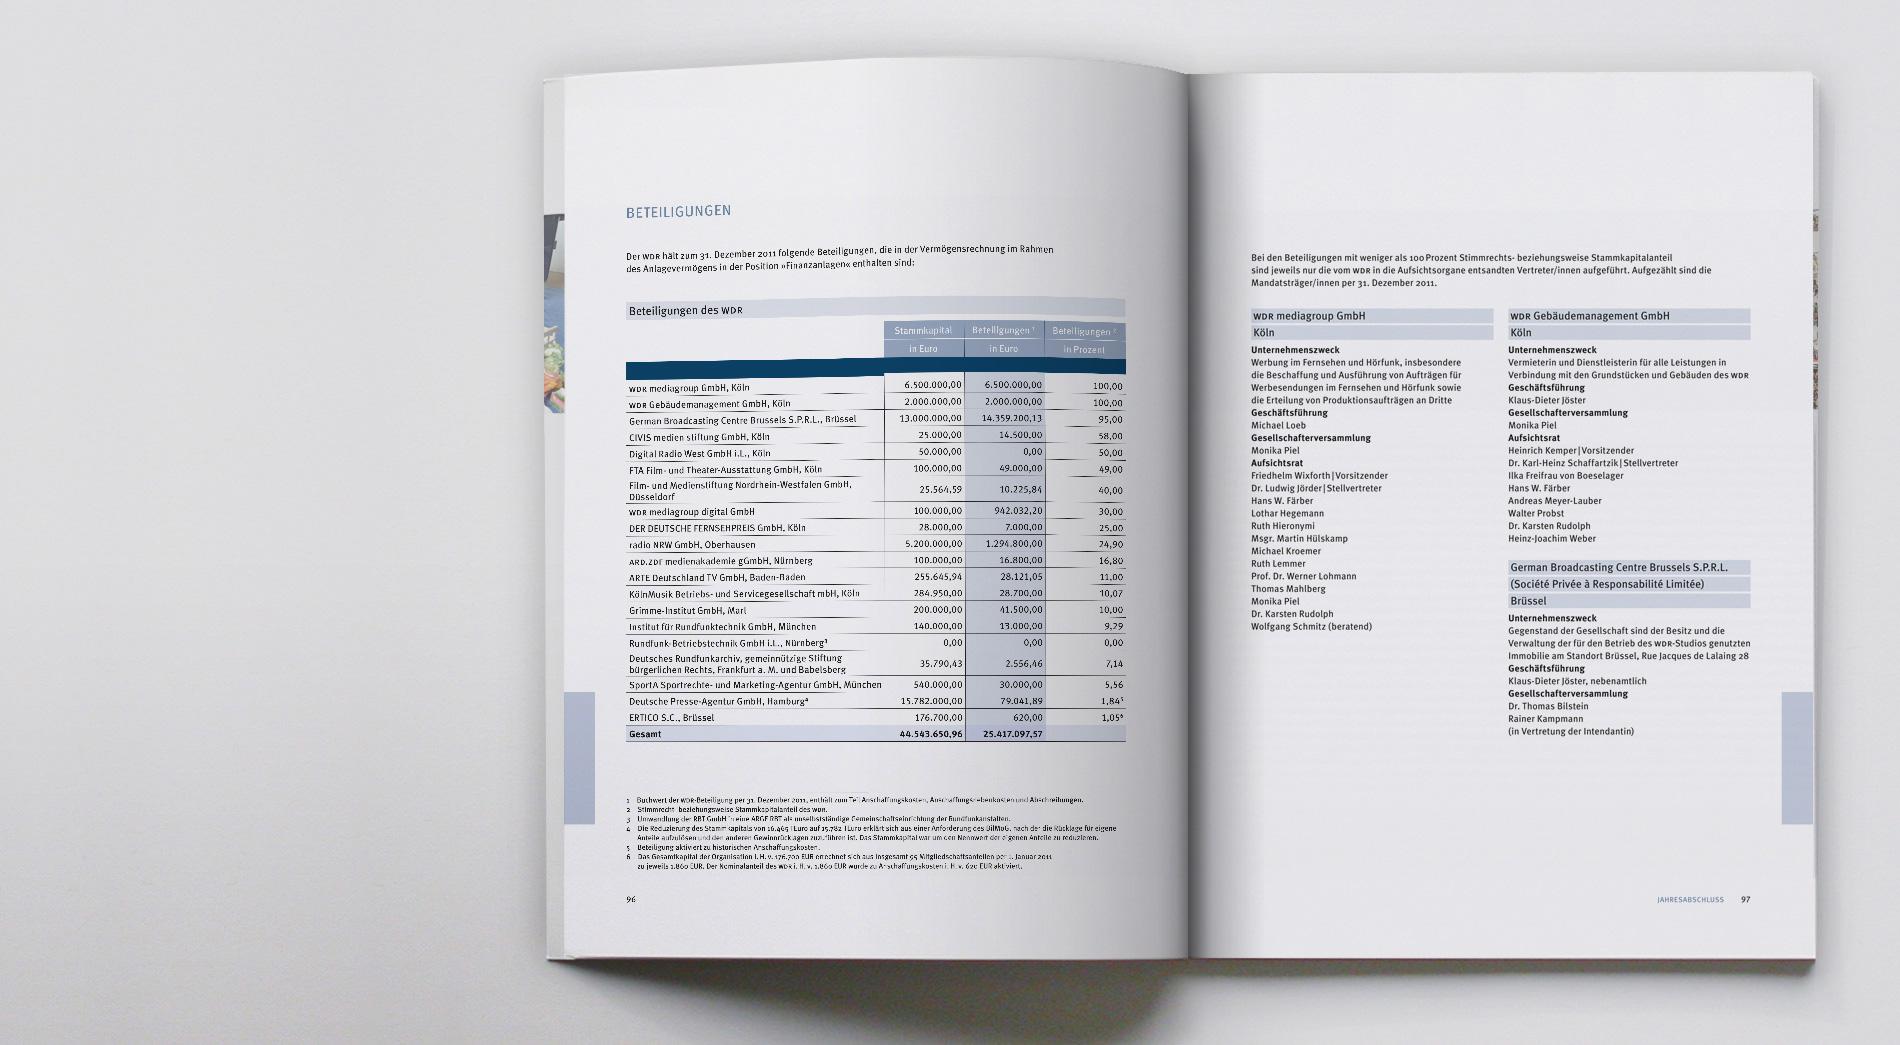 Tabellenteil, WDR Geschäftsbericht 2011